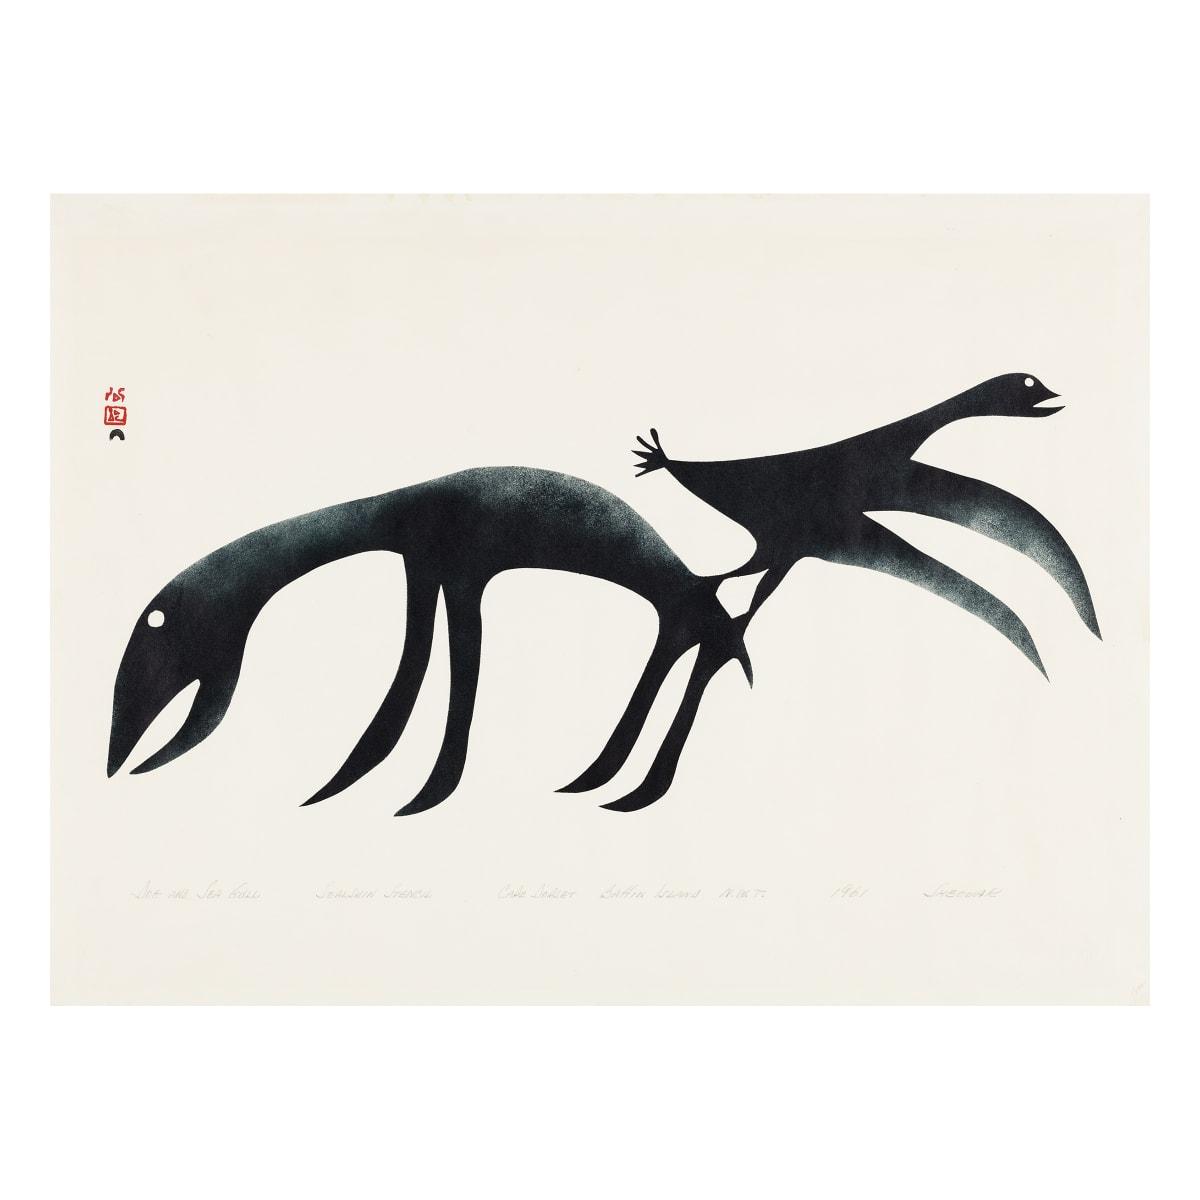 SHEOUAK PETAULASSIE (1923-1961) KINNGAIT (CAPE DORSET) Dog and Seagull, 1961 REALIZED: $2,040